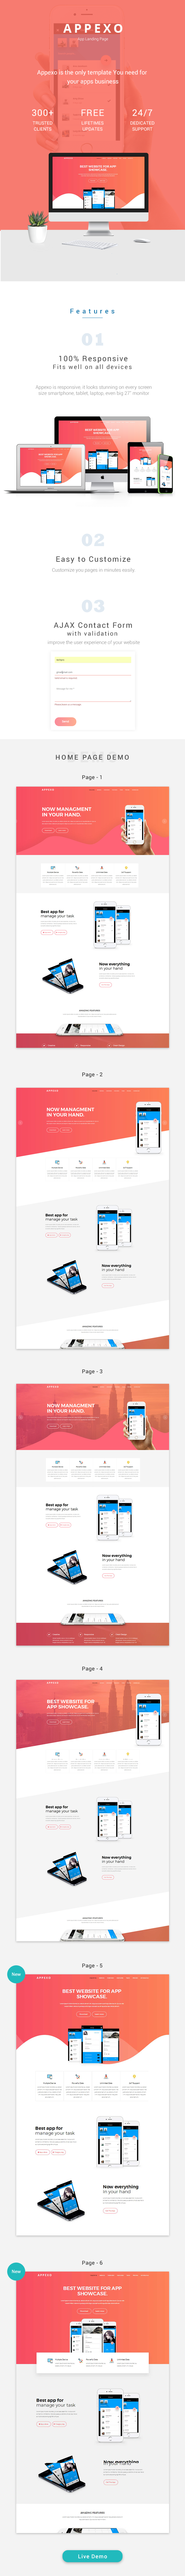 Appexo App Landing Page. - 4